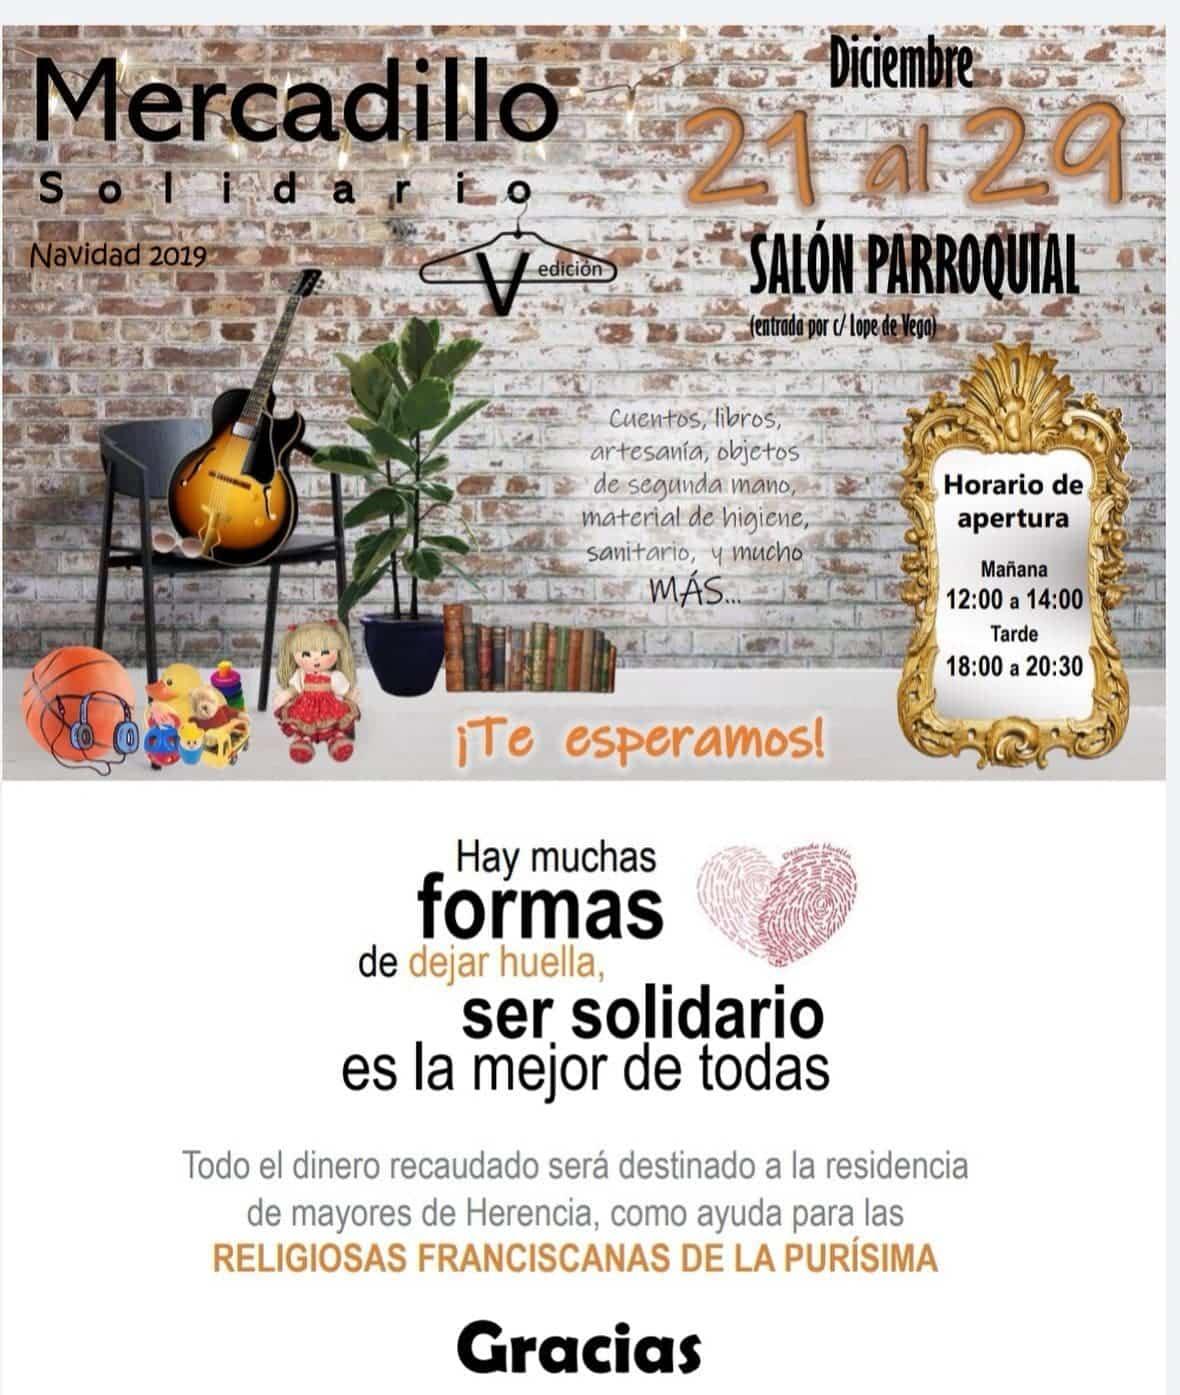 Mercadillo Solidario en Herencia esta navidades 3